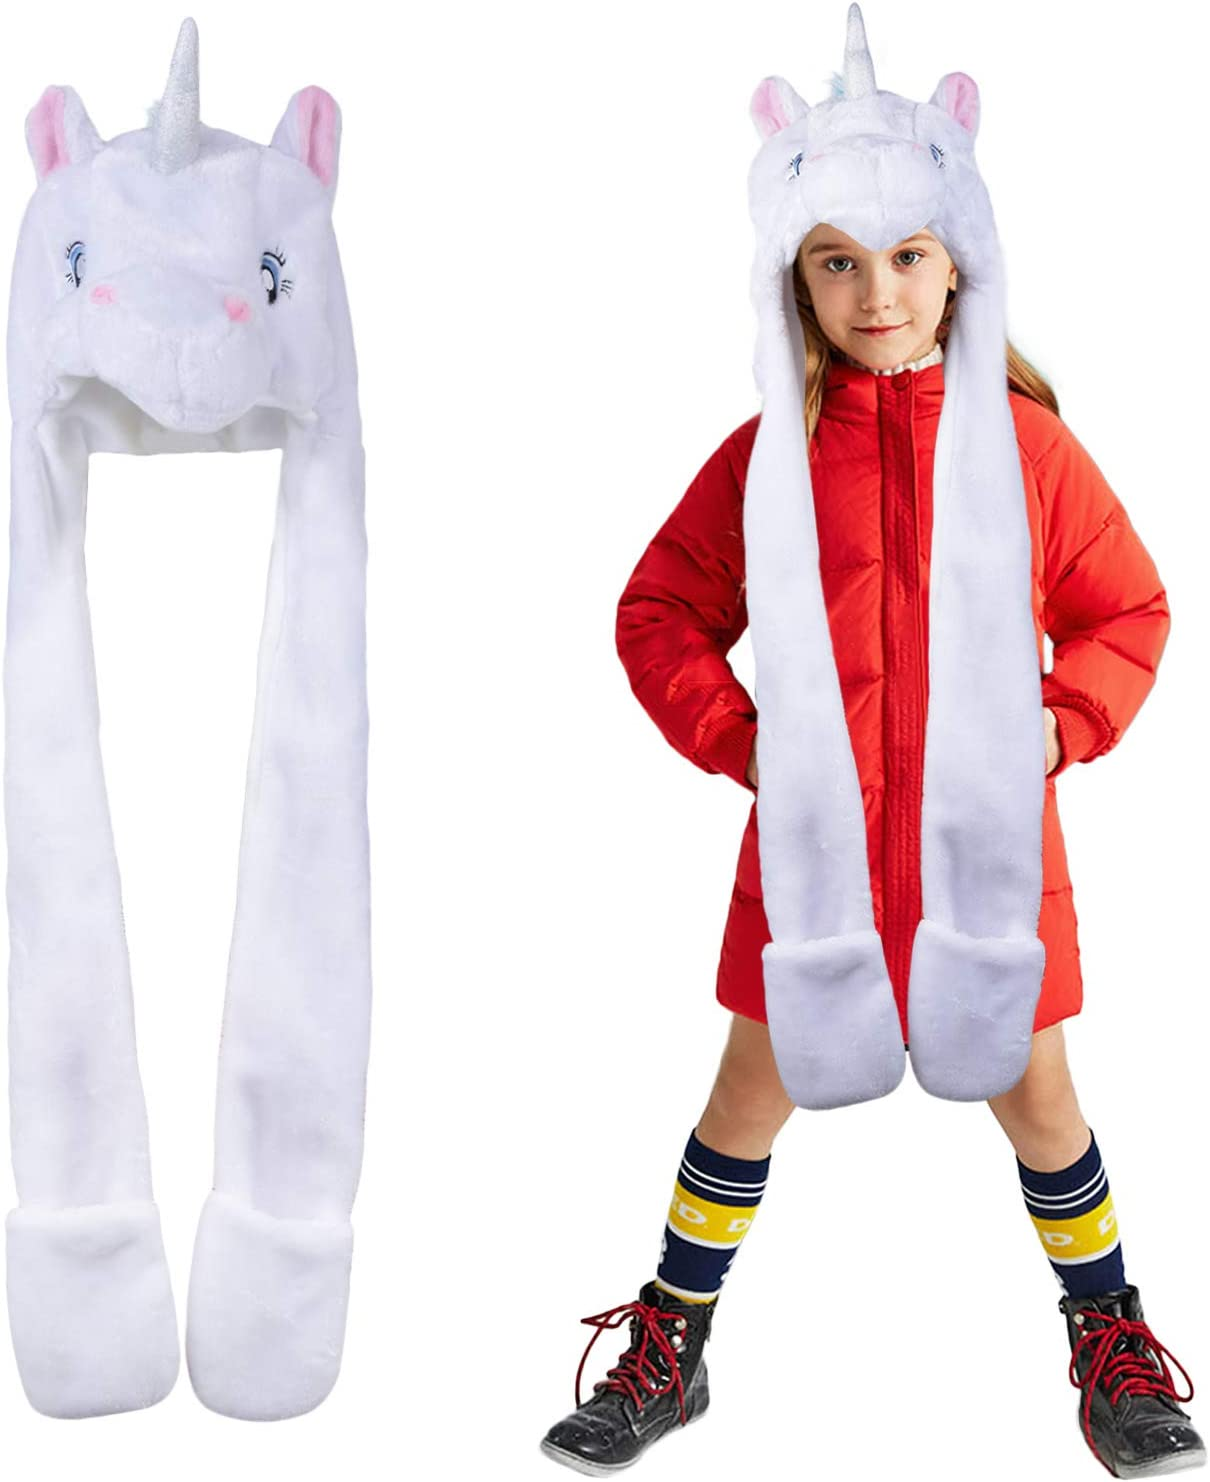 Unisex Cozy Plush Unicorn Hooded Scarf Earflap Cap with Pocket /& Rainbow Mane Teens Beanies Party Hat Maticr